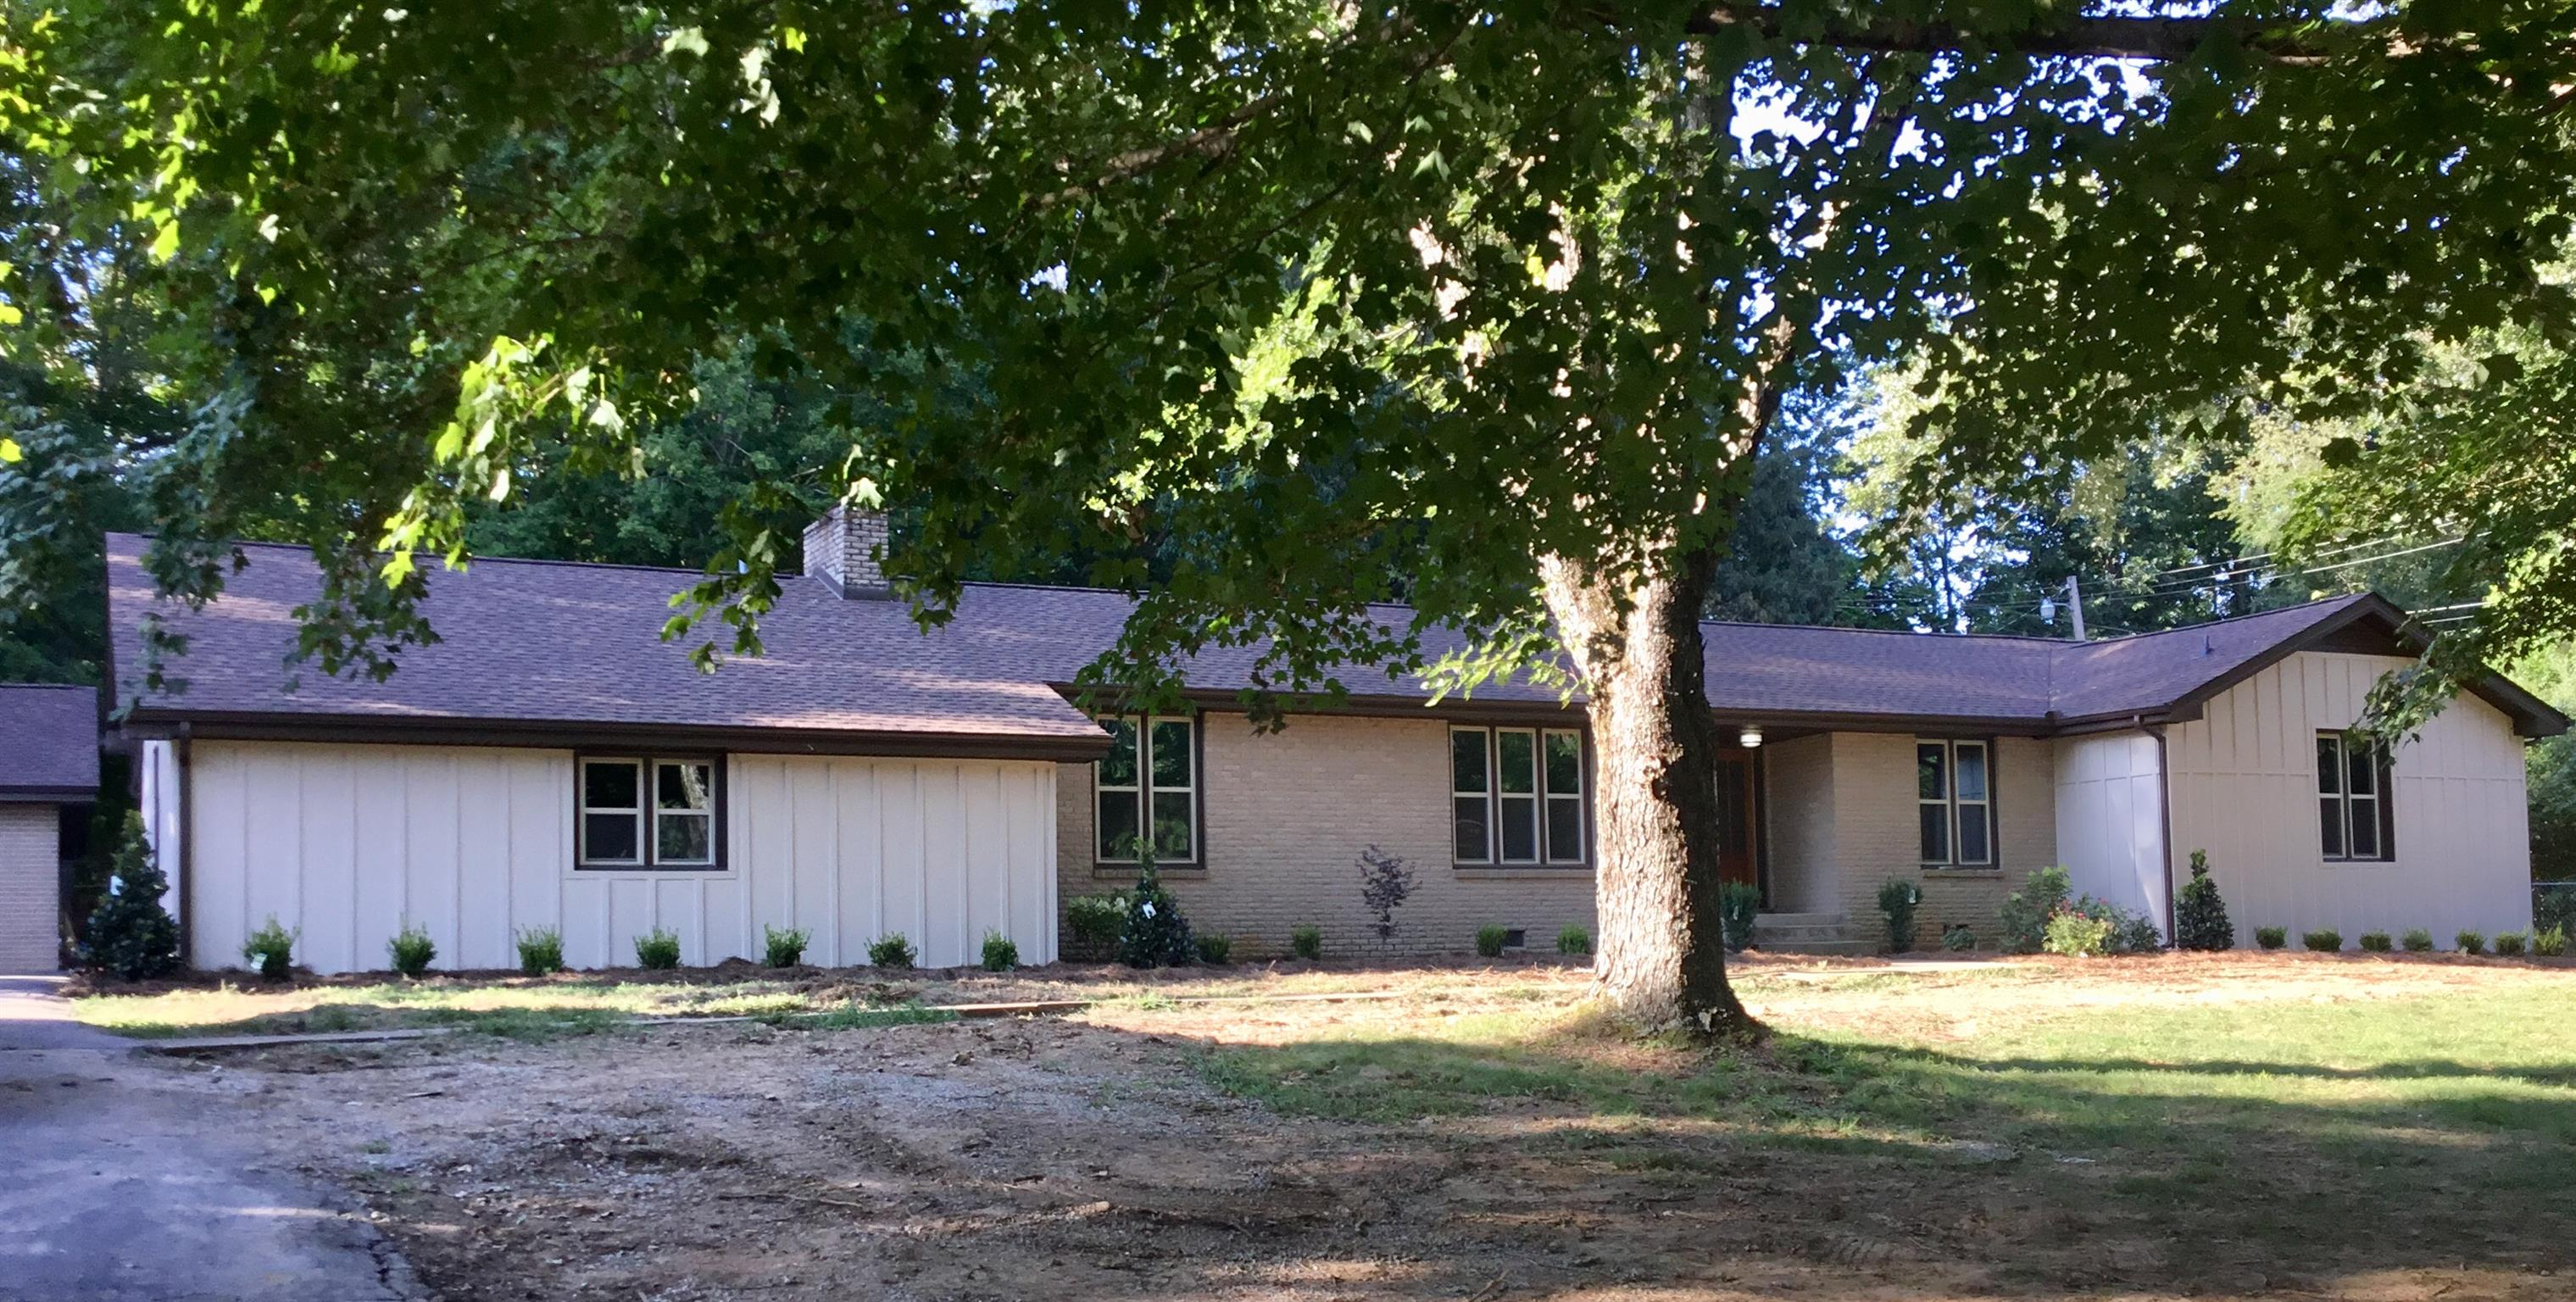 918 Lucy Ln, Clarksville, TN 37043 - Clarksville, TN real estate listing